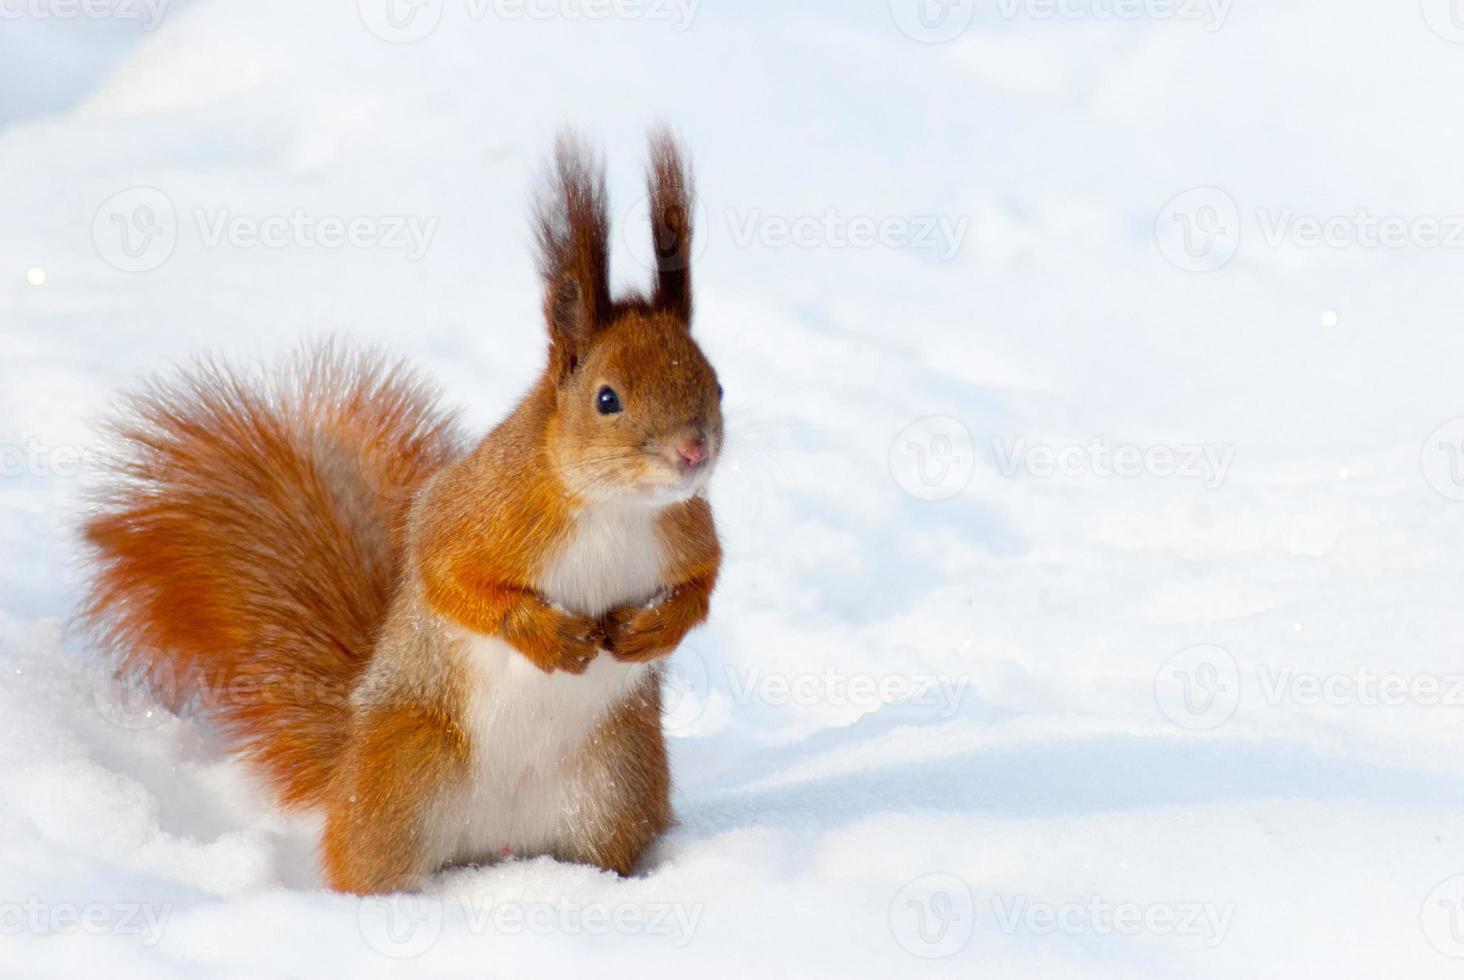 röd ekorre på snön foto